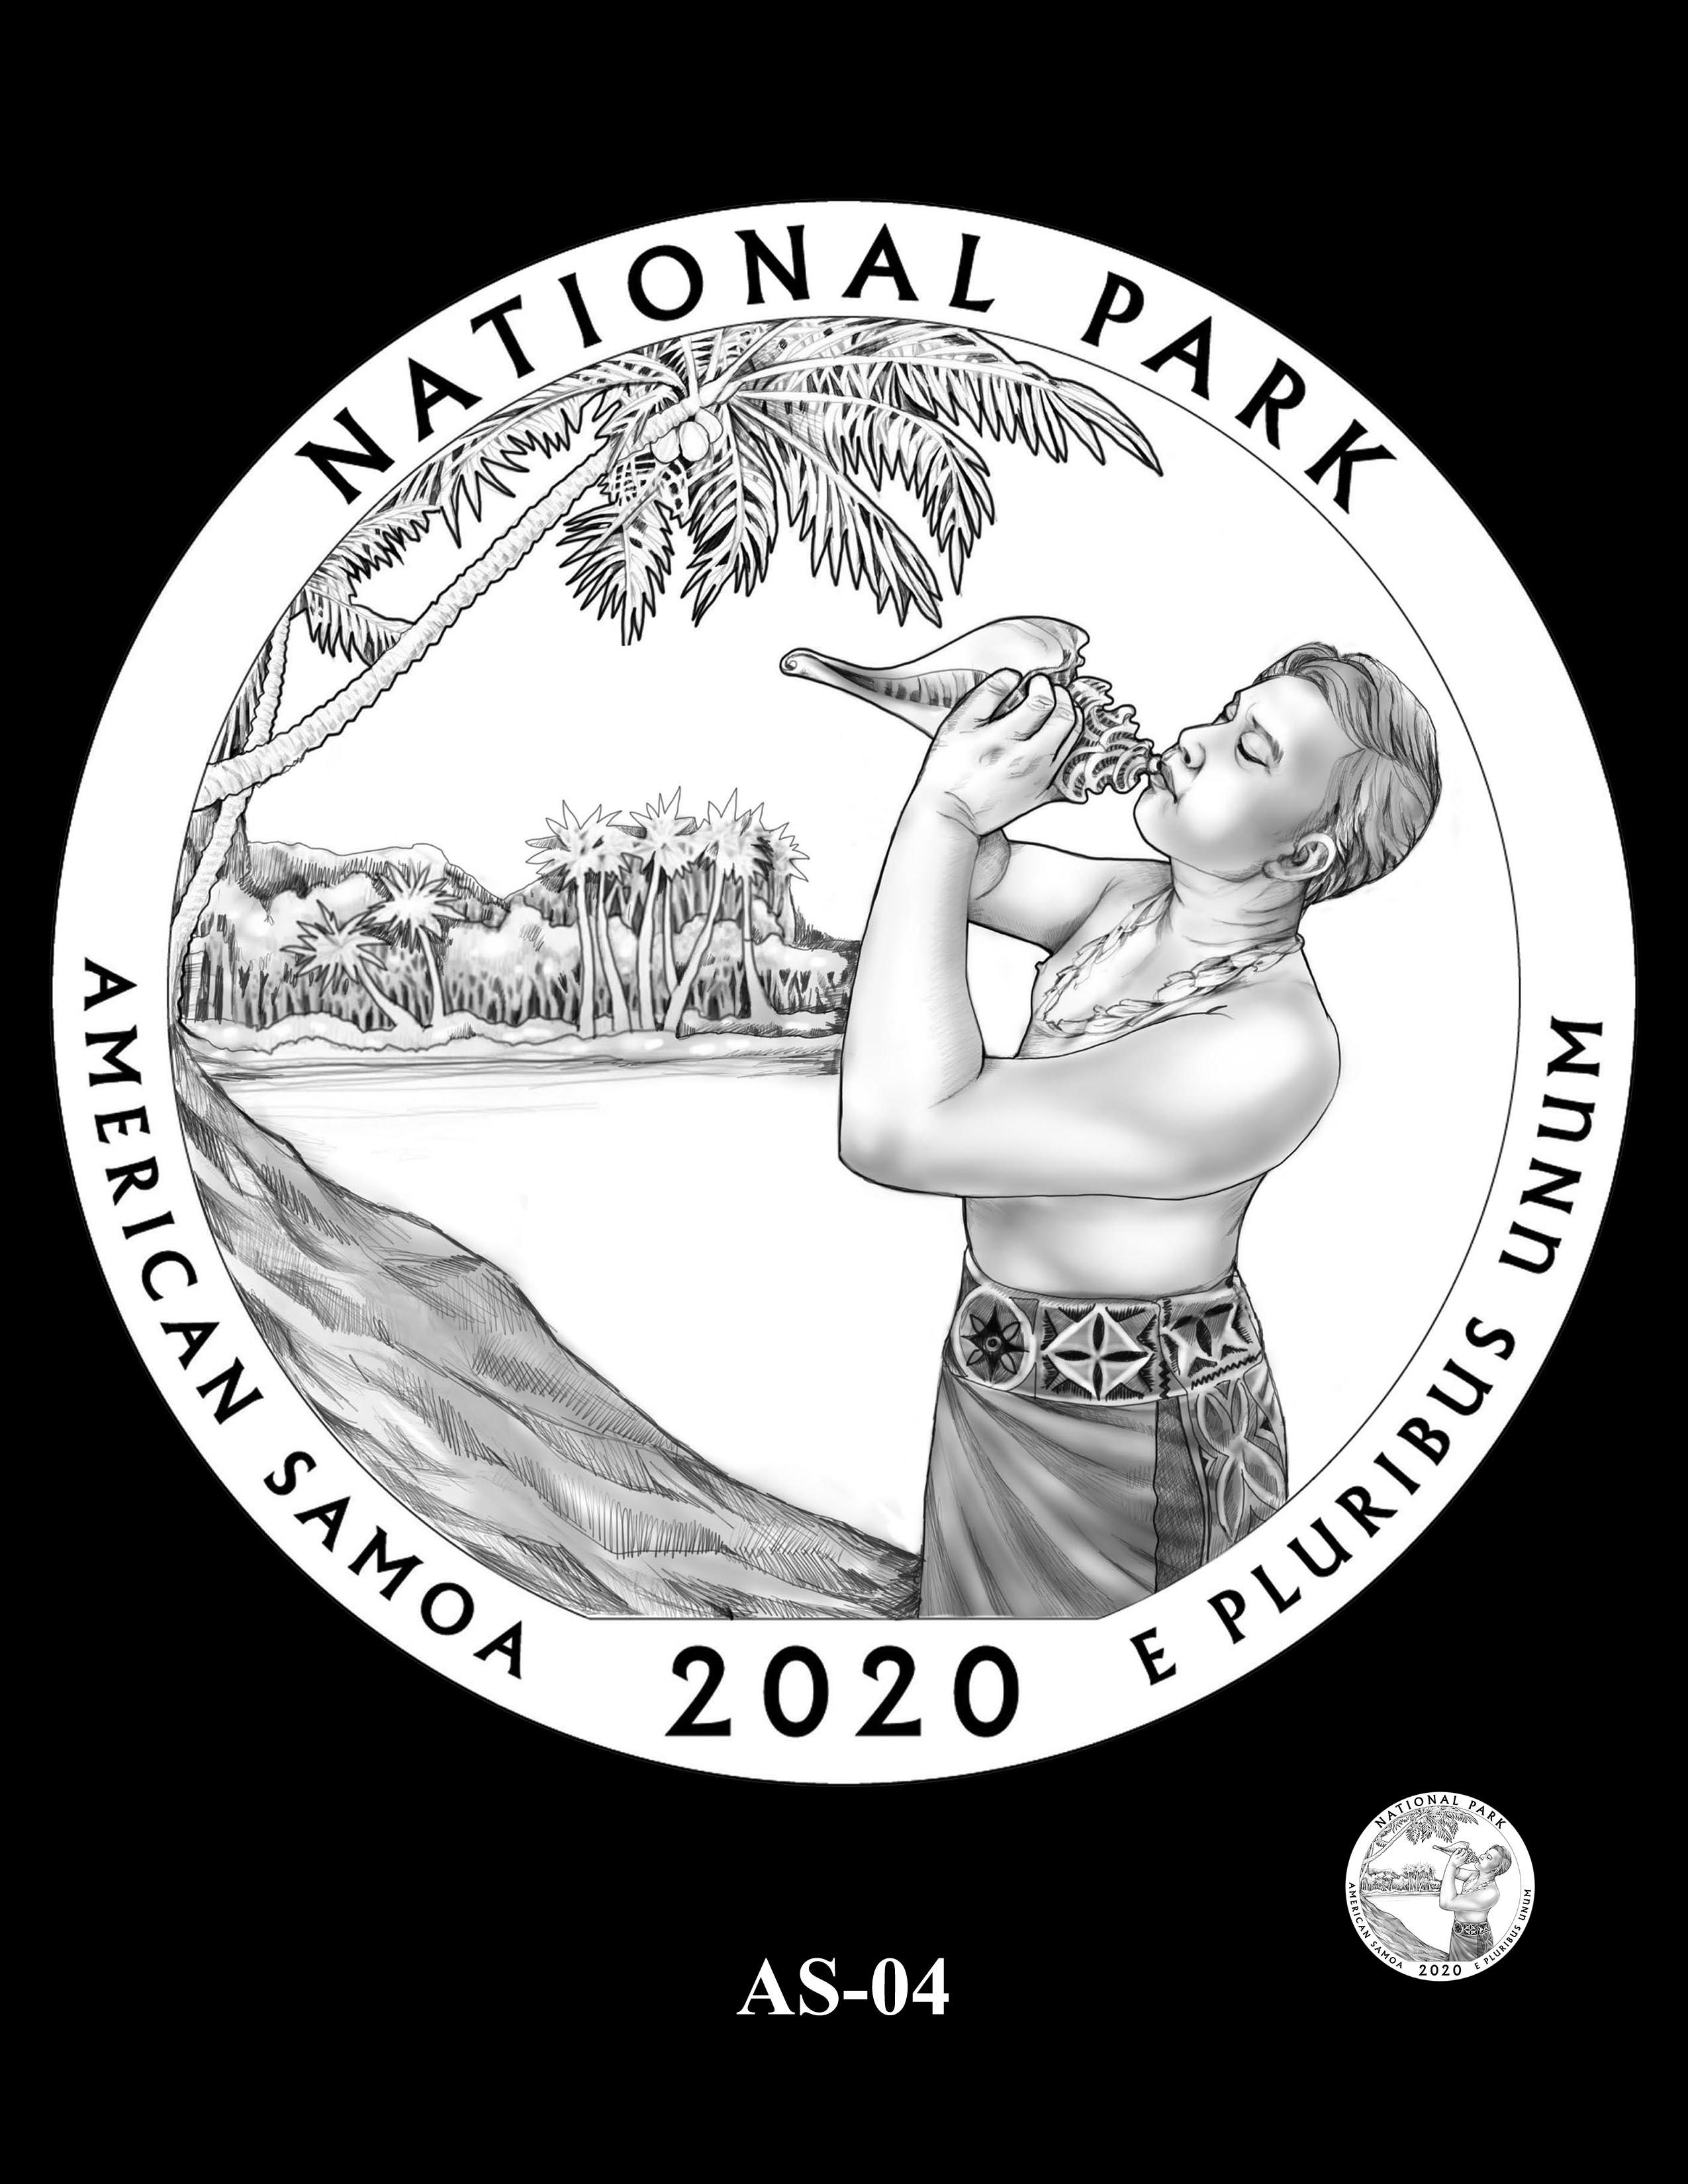 AS-04 -- 2020 America the Beautiful Quarters® Program